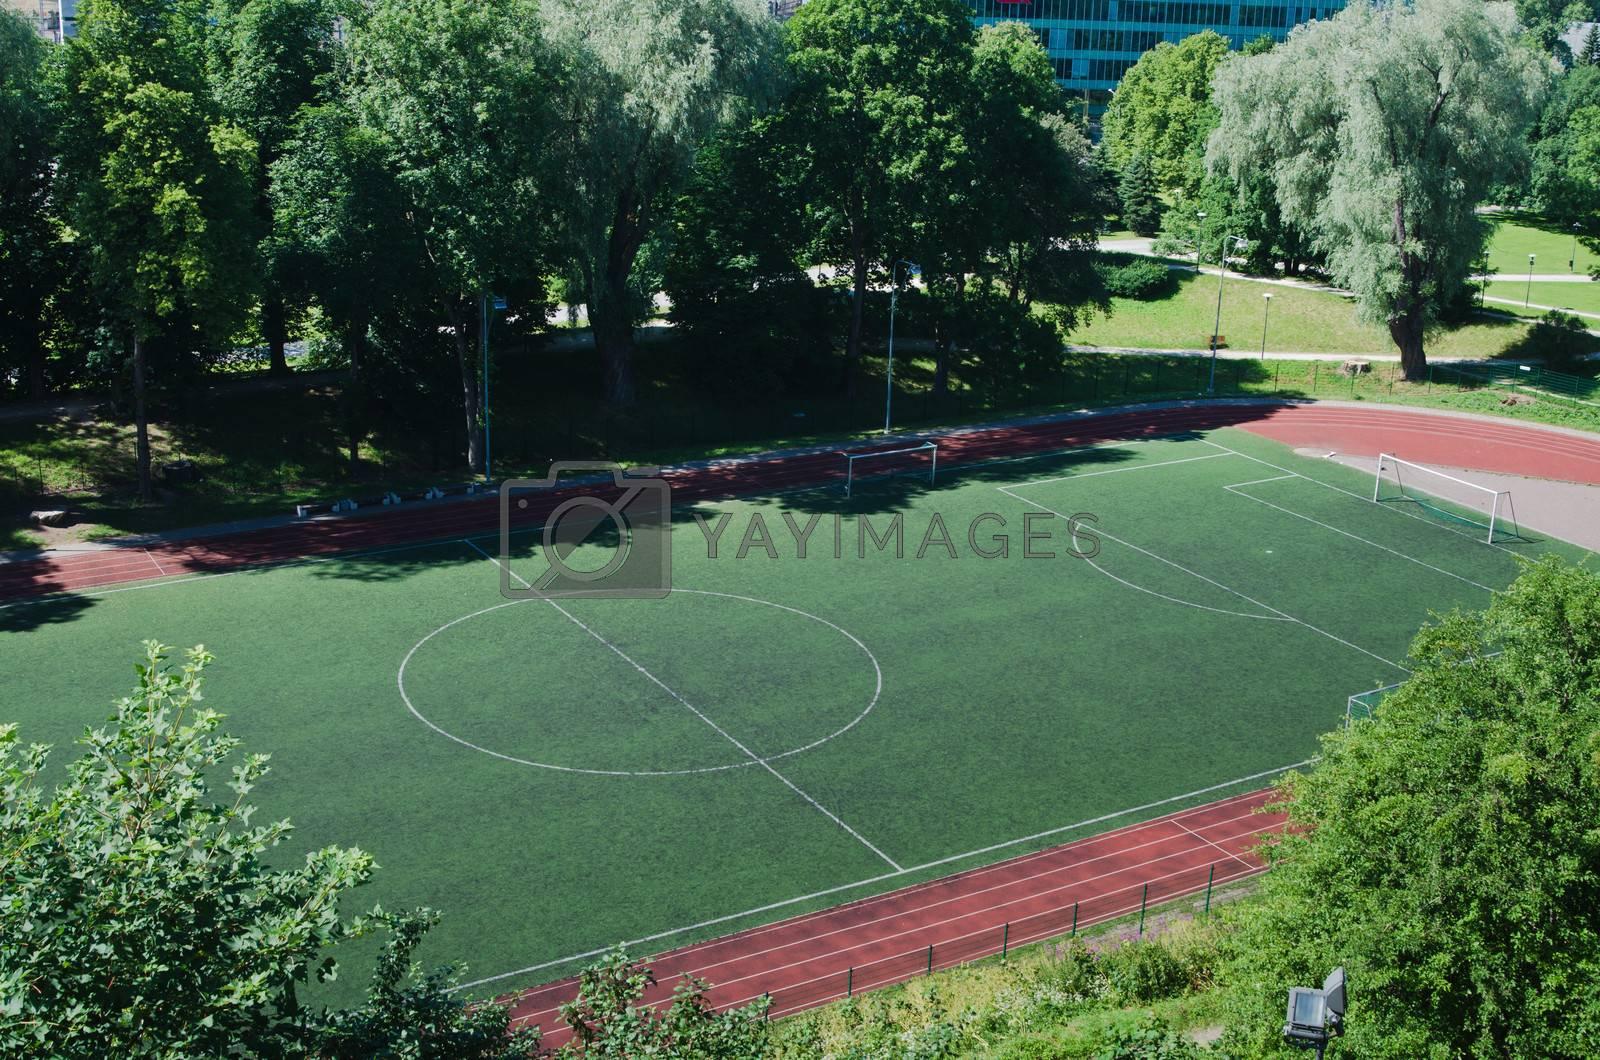 Stadium, football field. The top view